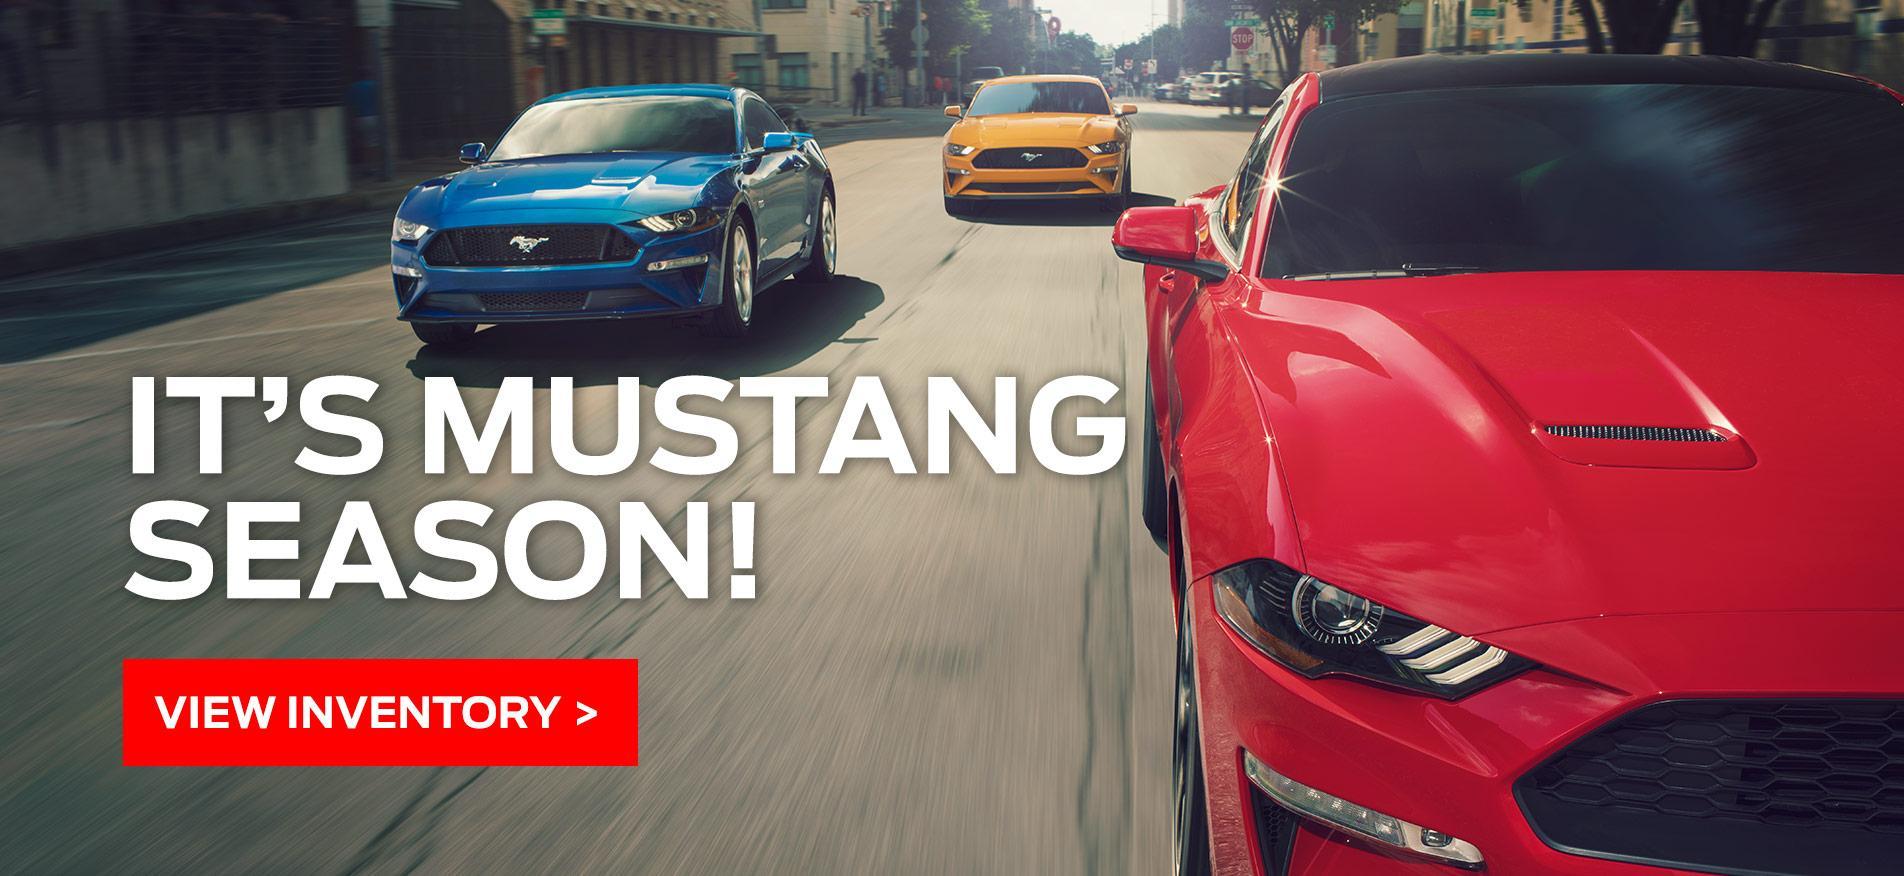 Cavalcade Ford - Mustang Offer